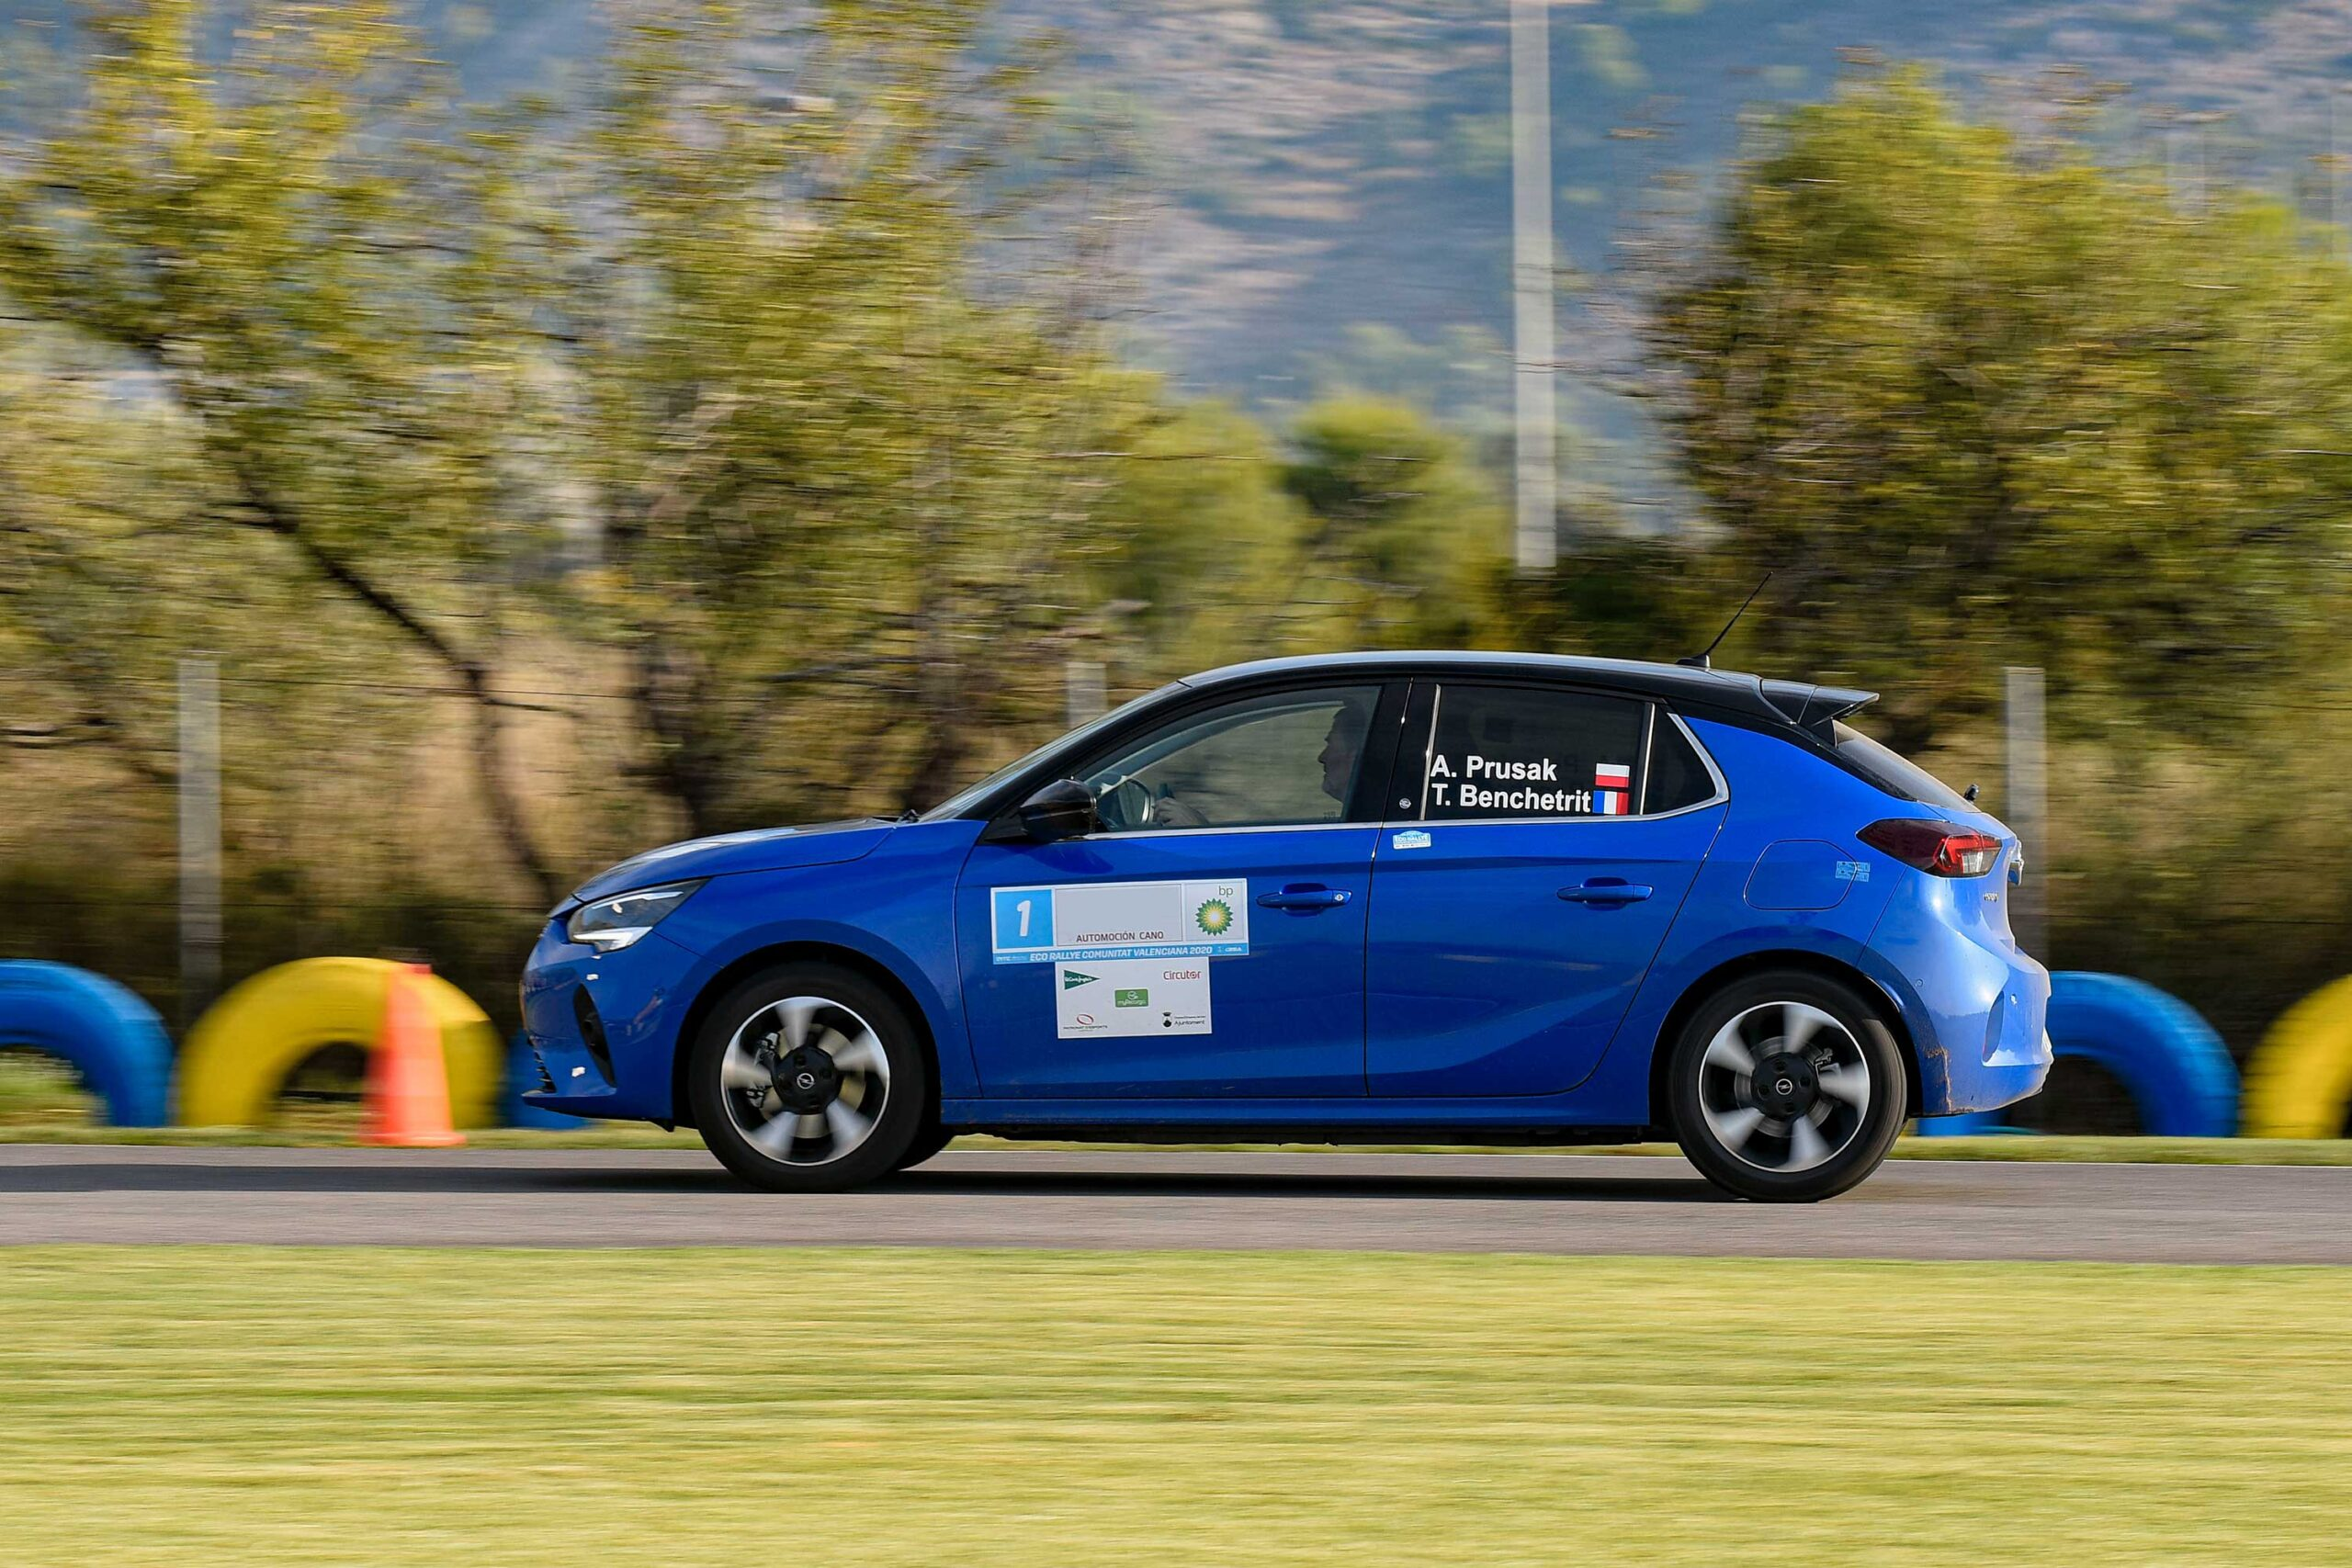 Електромобіль Opel Corsa-e виграв Гоночний Кубок FIA E-Rally Regularity Cup